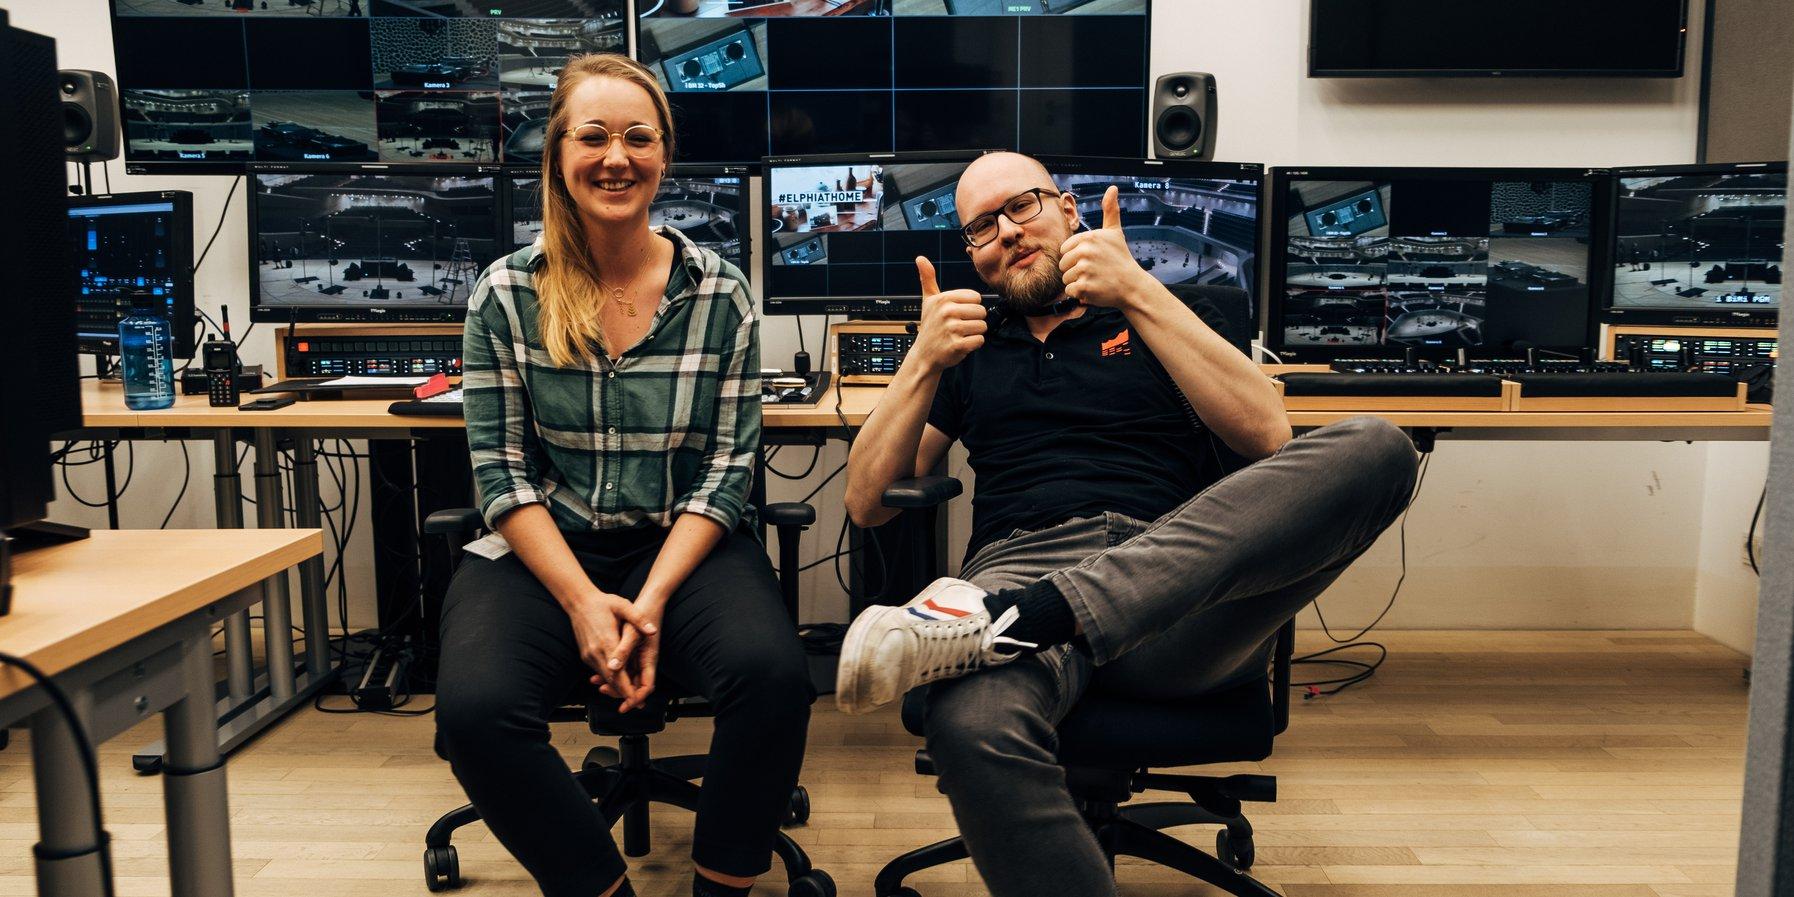 Technik-Mitarbeiter bei Helena Hauff